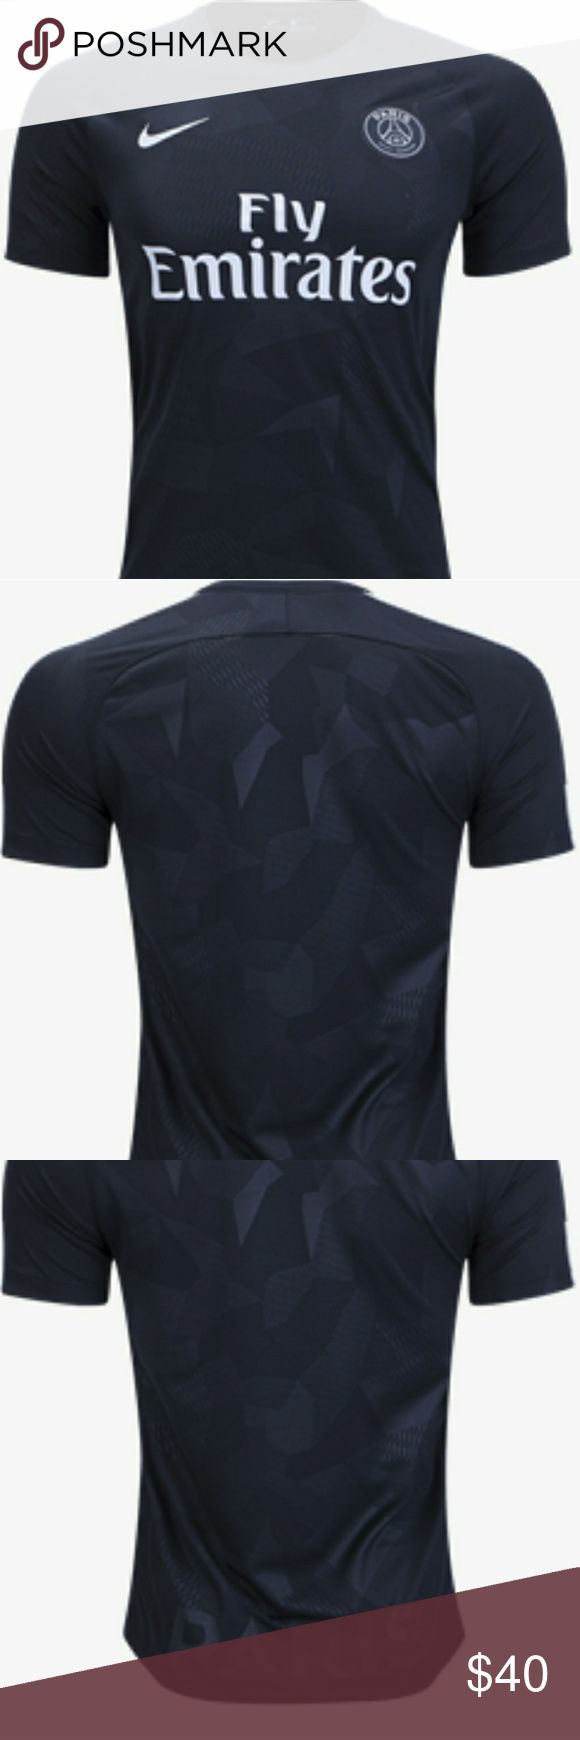 PSG THIRD BLACK AWAY JERSEY CHAMPIONS LEAGUE This a brand new psg third away jersey season 17-18 champions league version Nike Shirts Tees - Short Sleeve